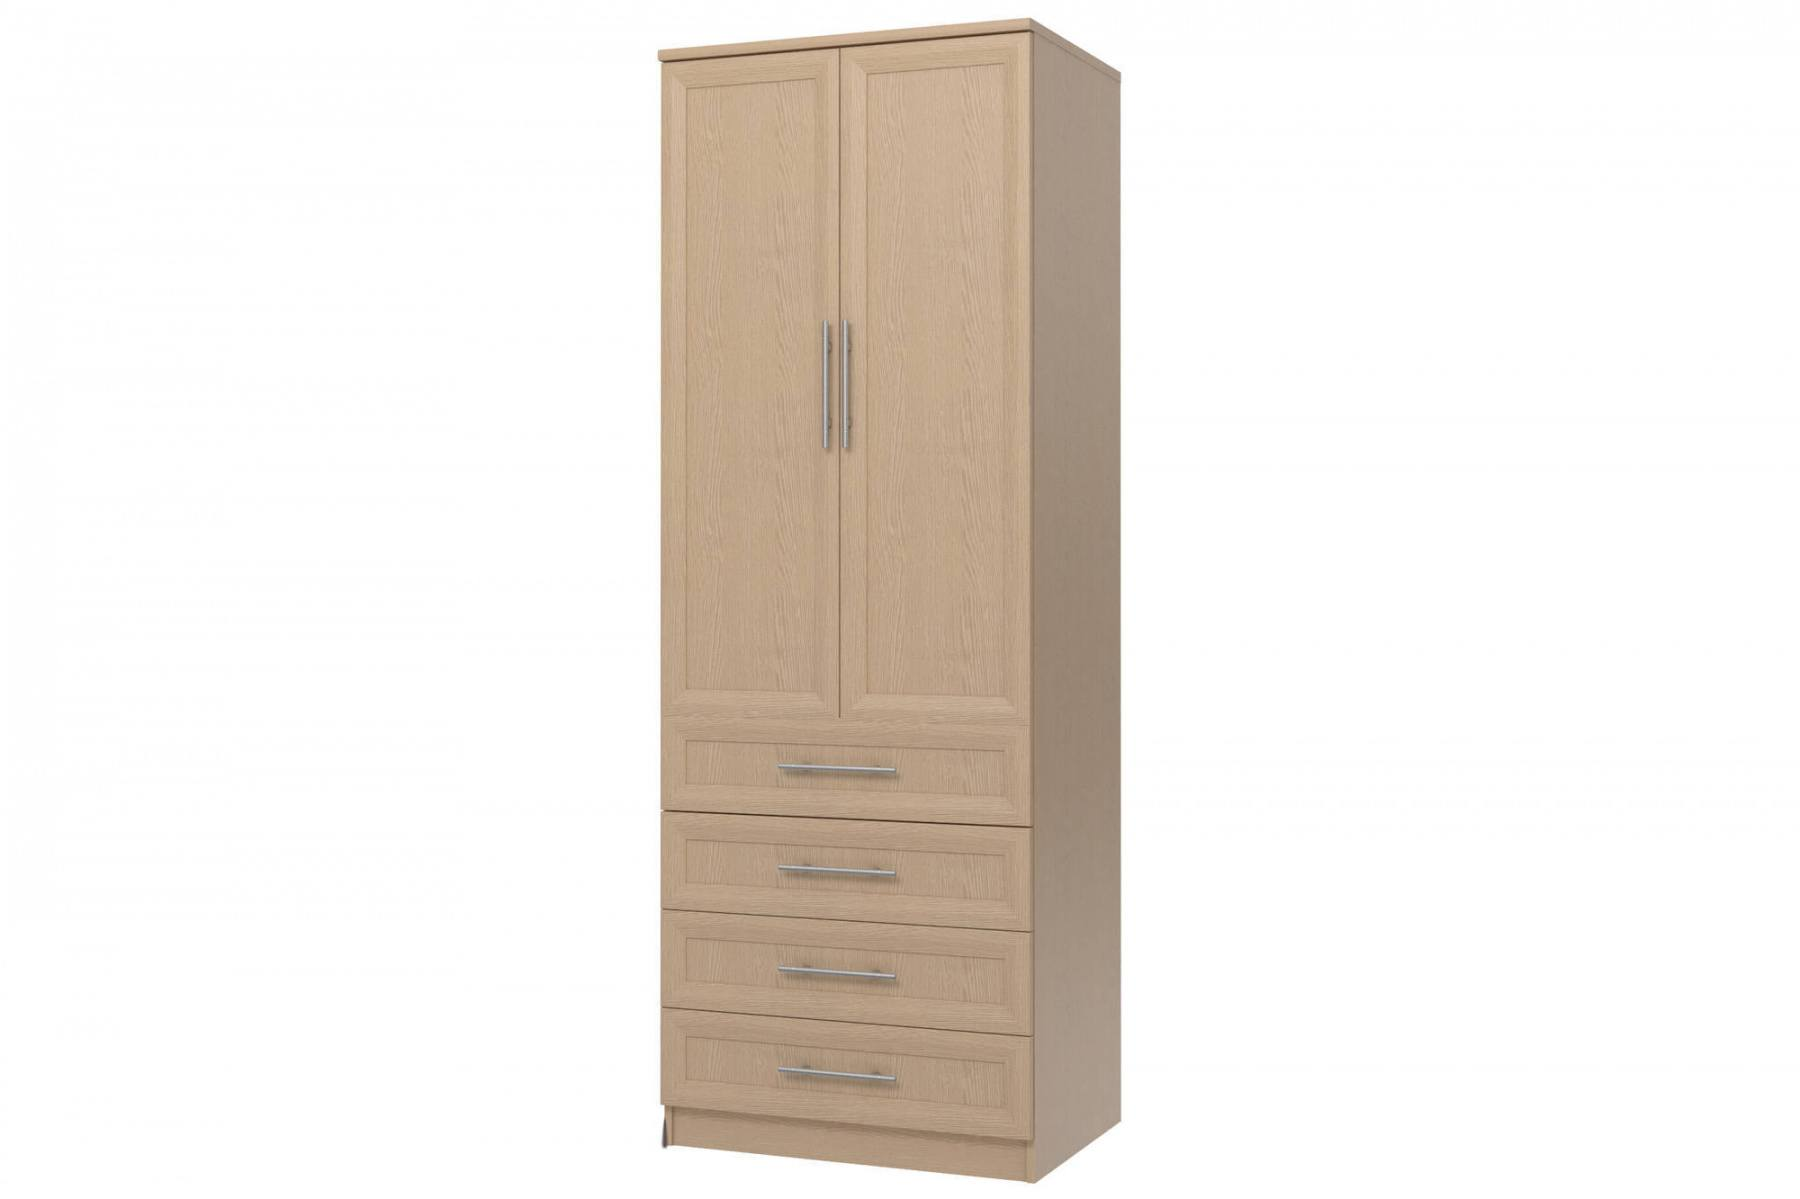 Шкаф 2-х дверный с 4-мя ящ. Юлианна СТЛ.Н 004.01-01М